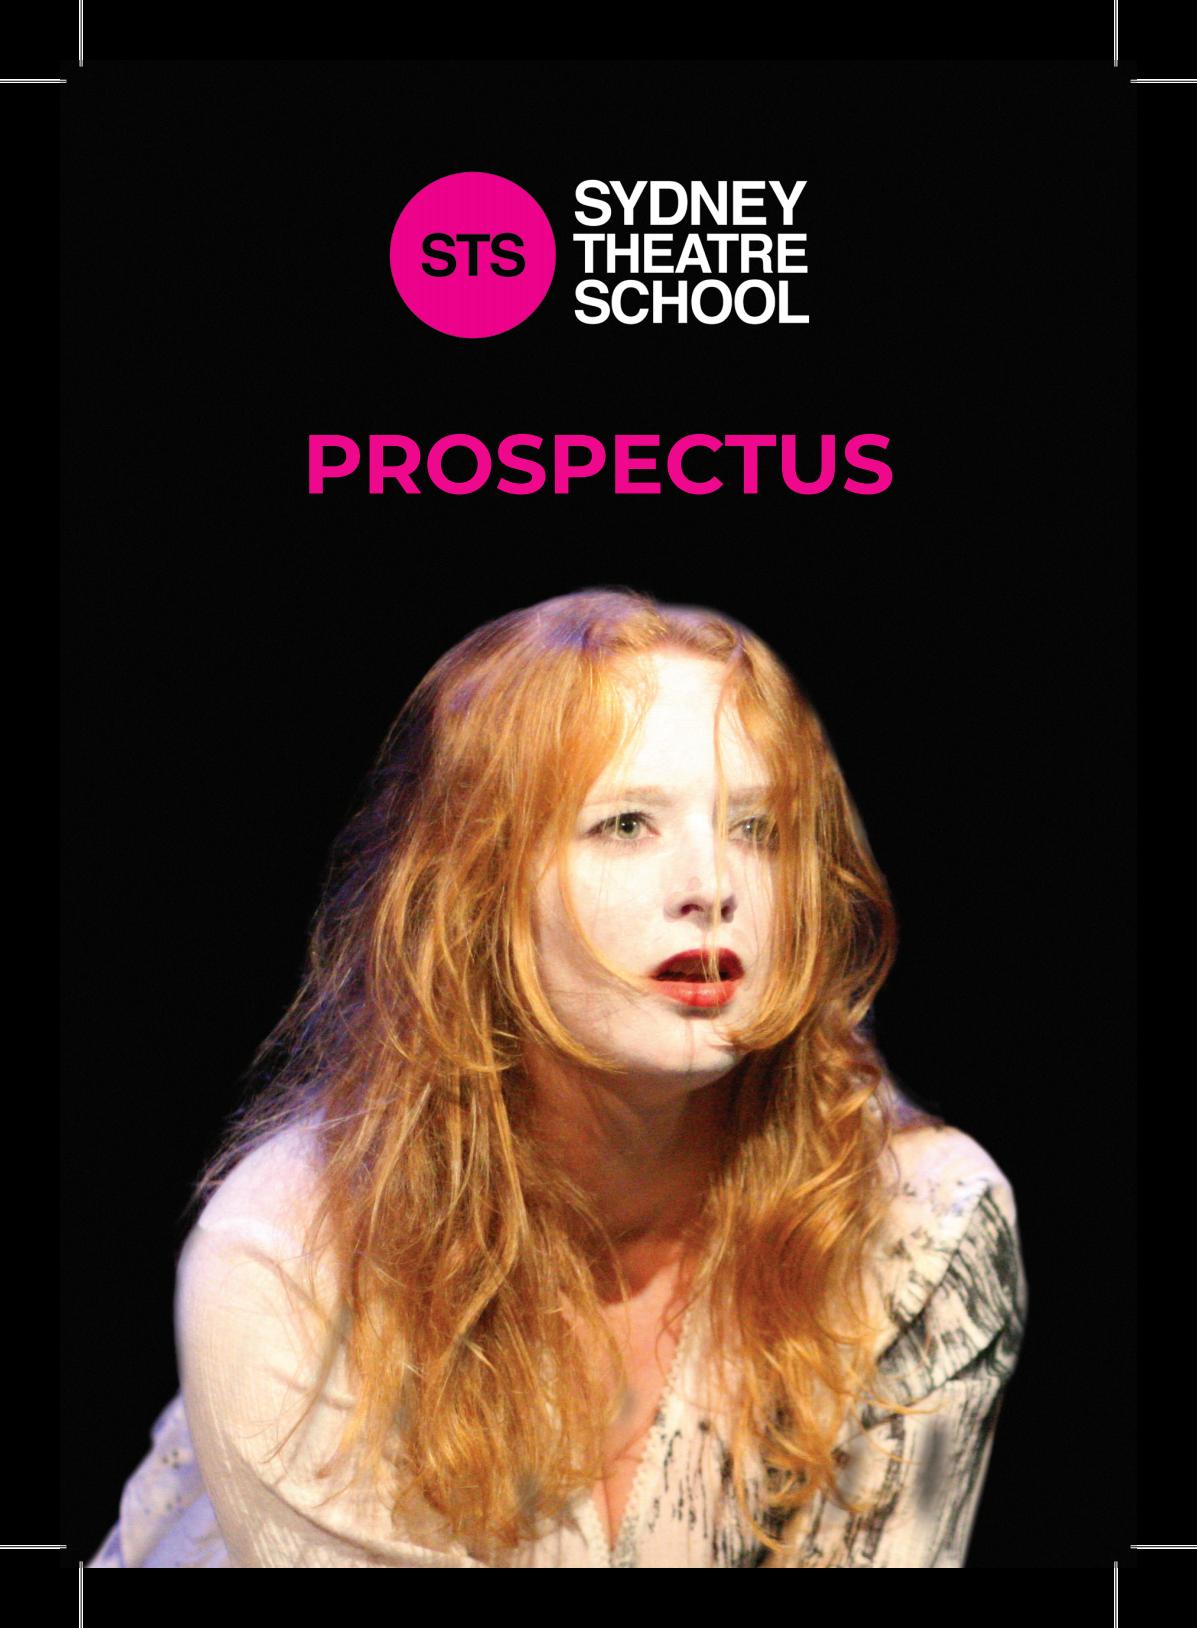 STS Prospectus